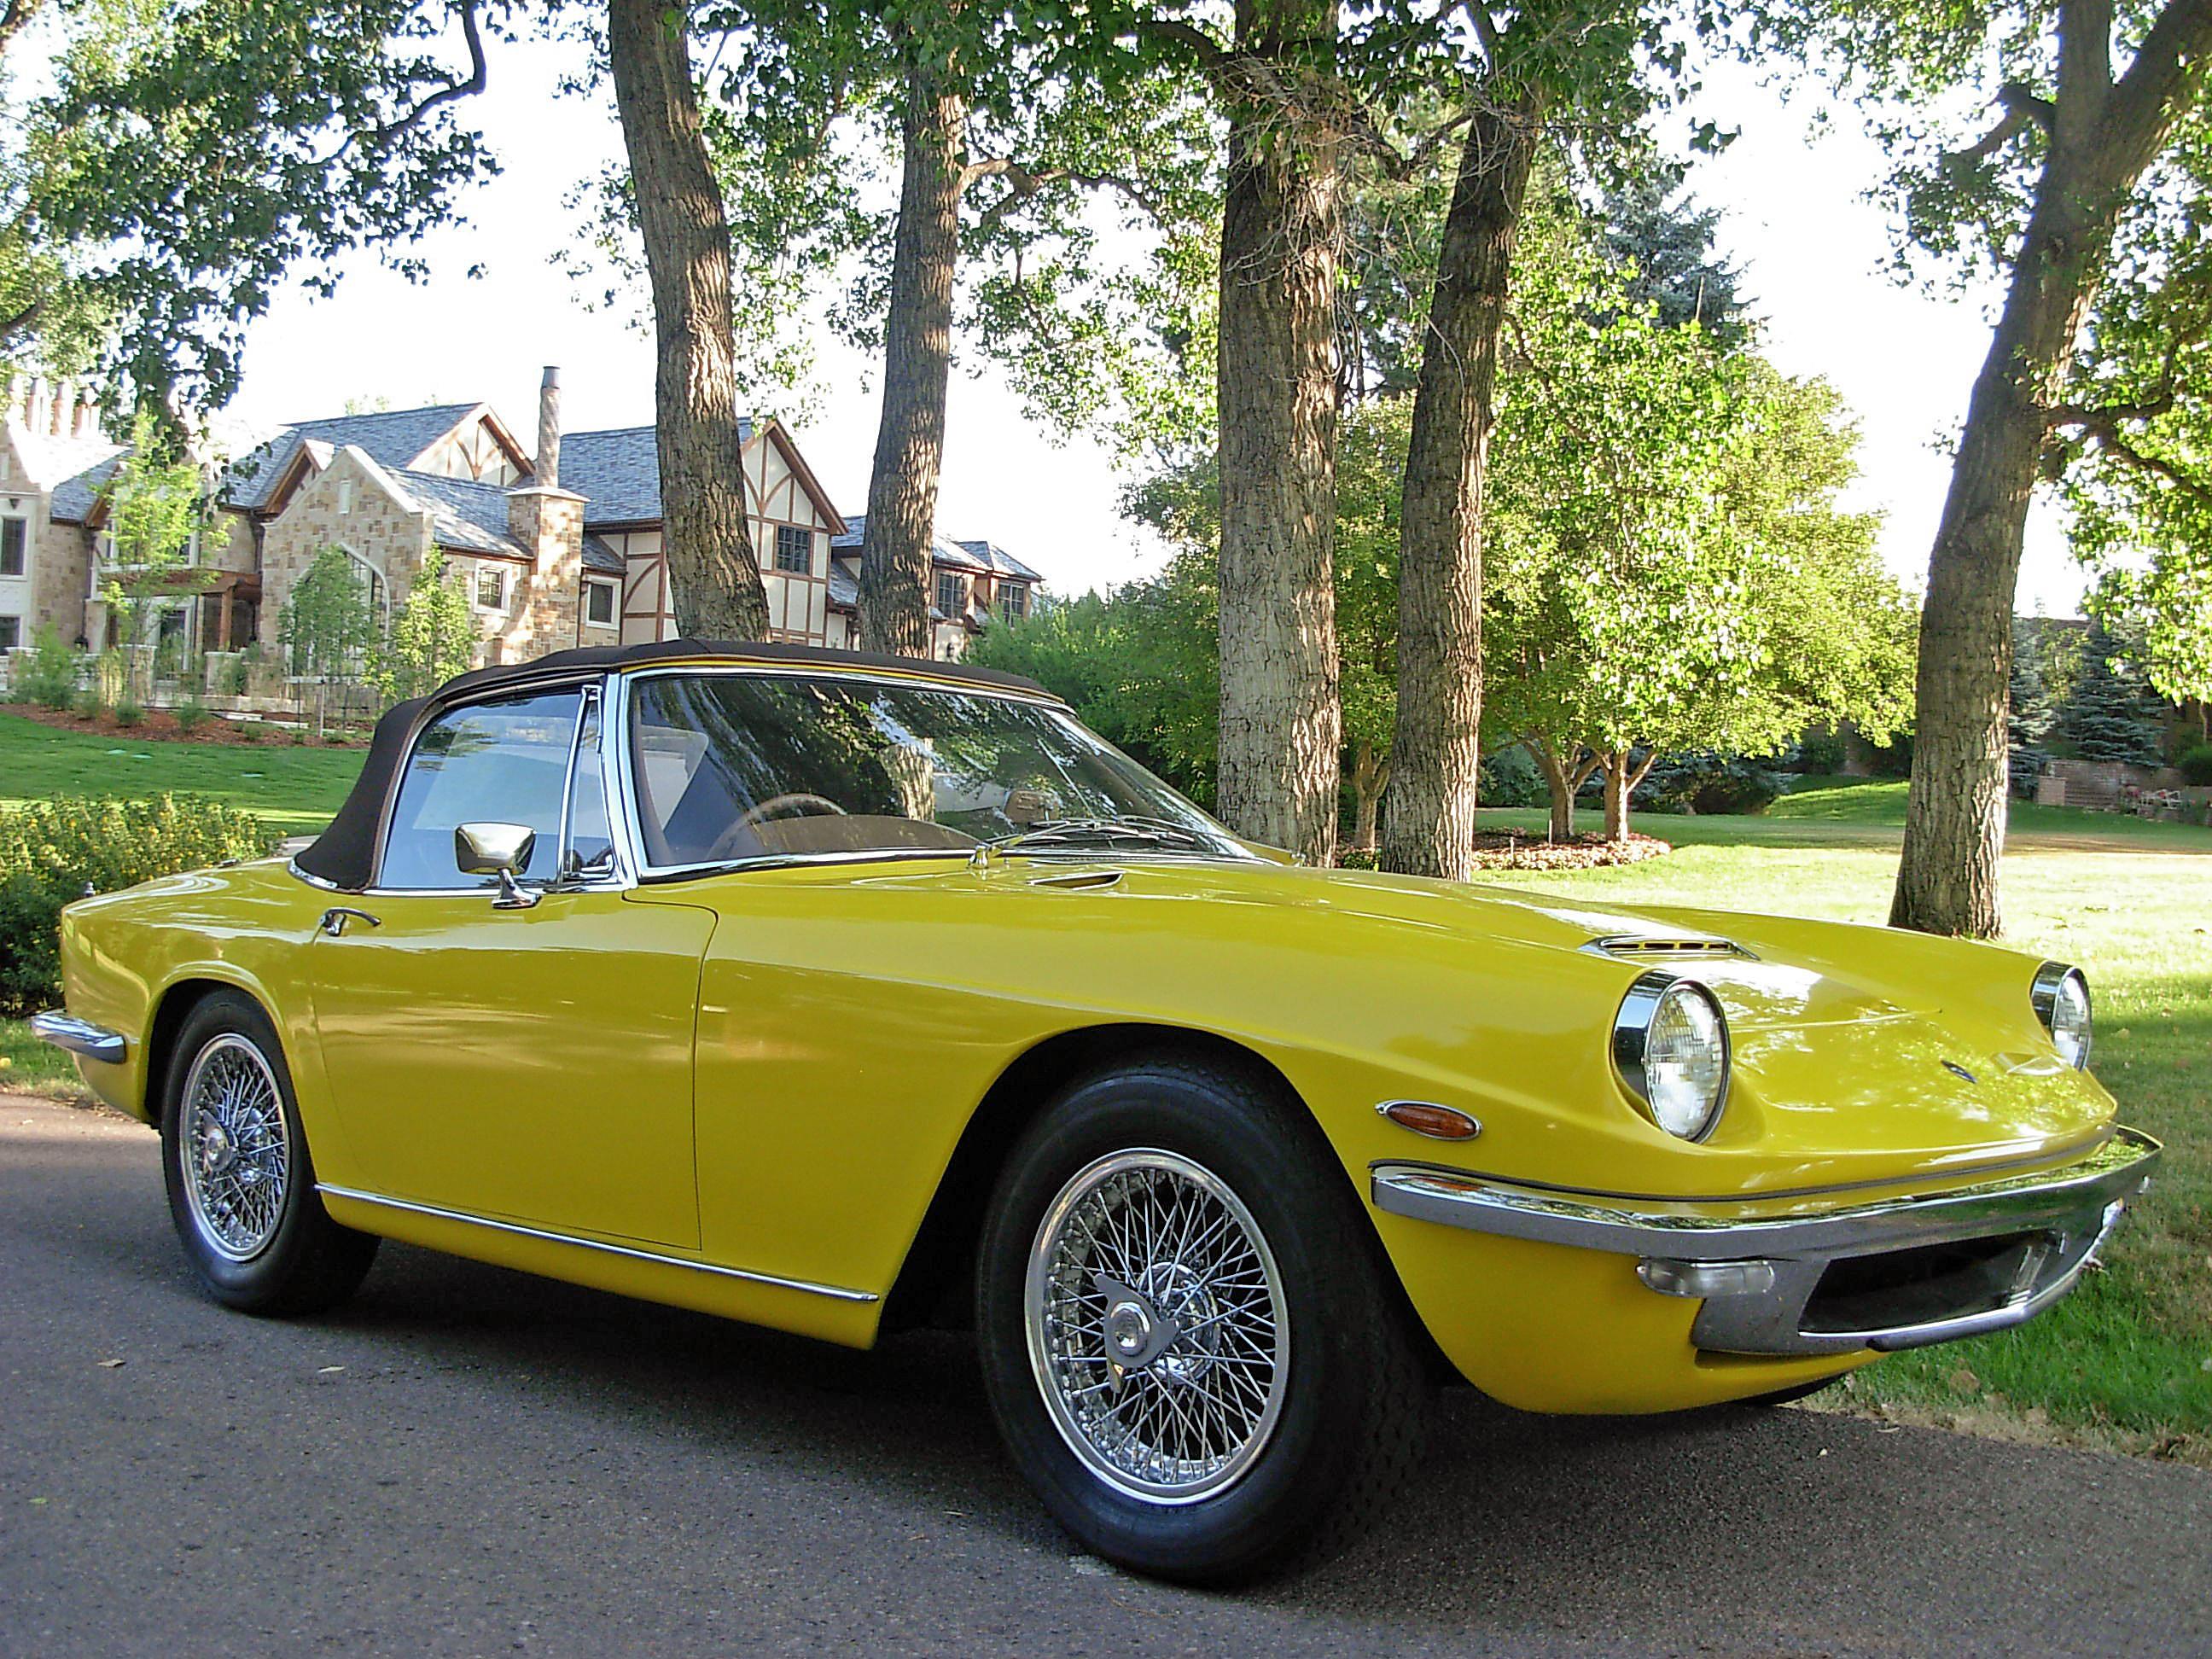 1966 Maserati Mistral 4000 Spyder Coachwork by Carrozzeria ...